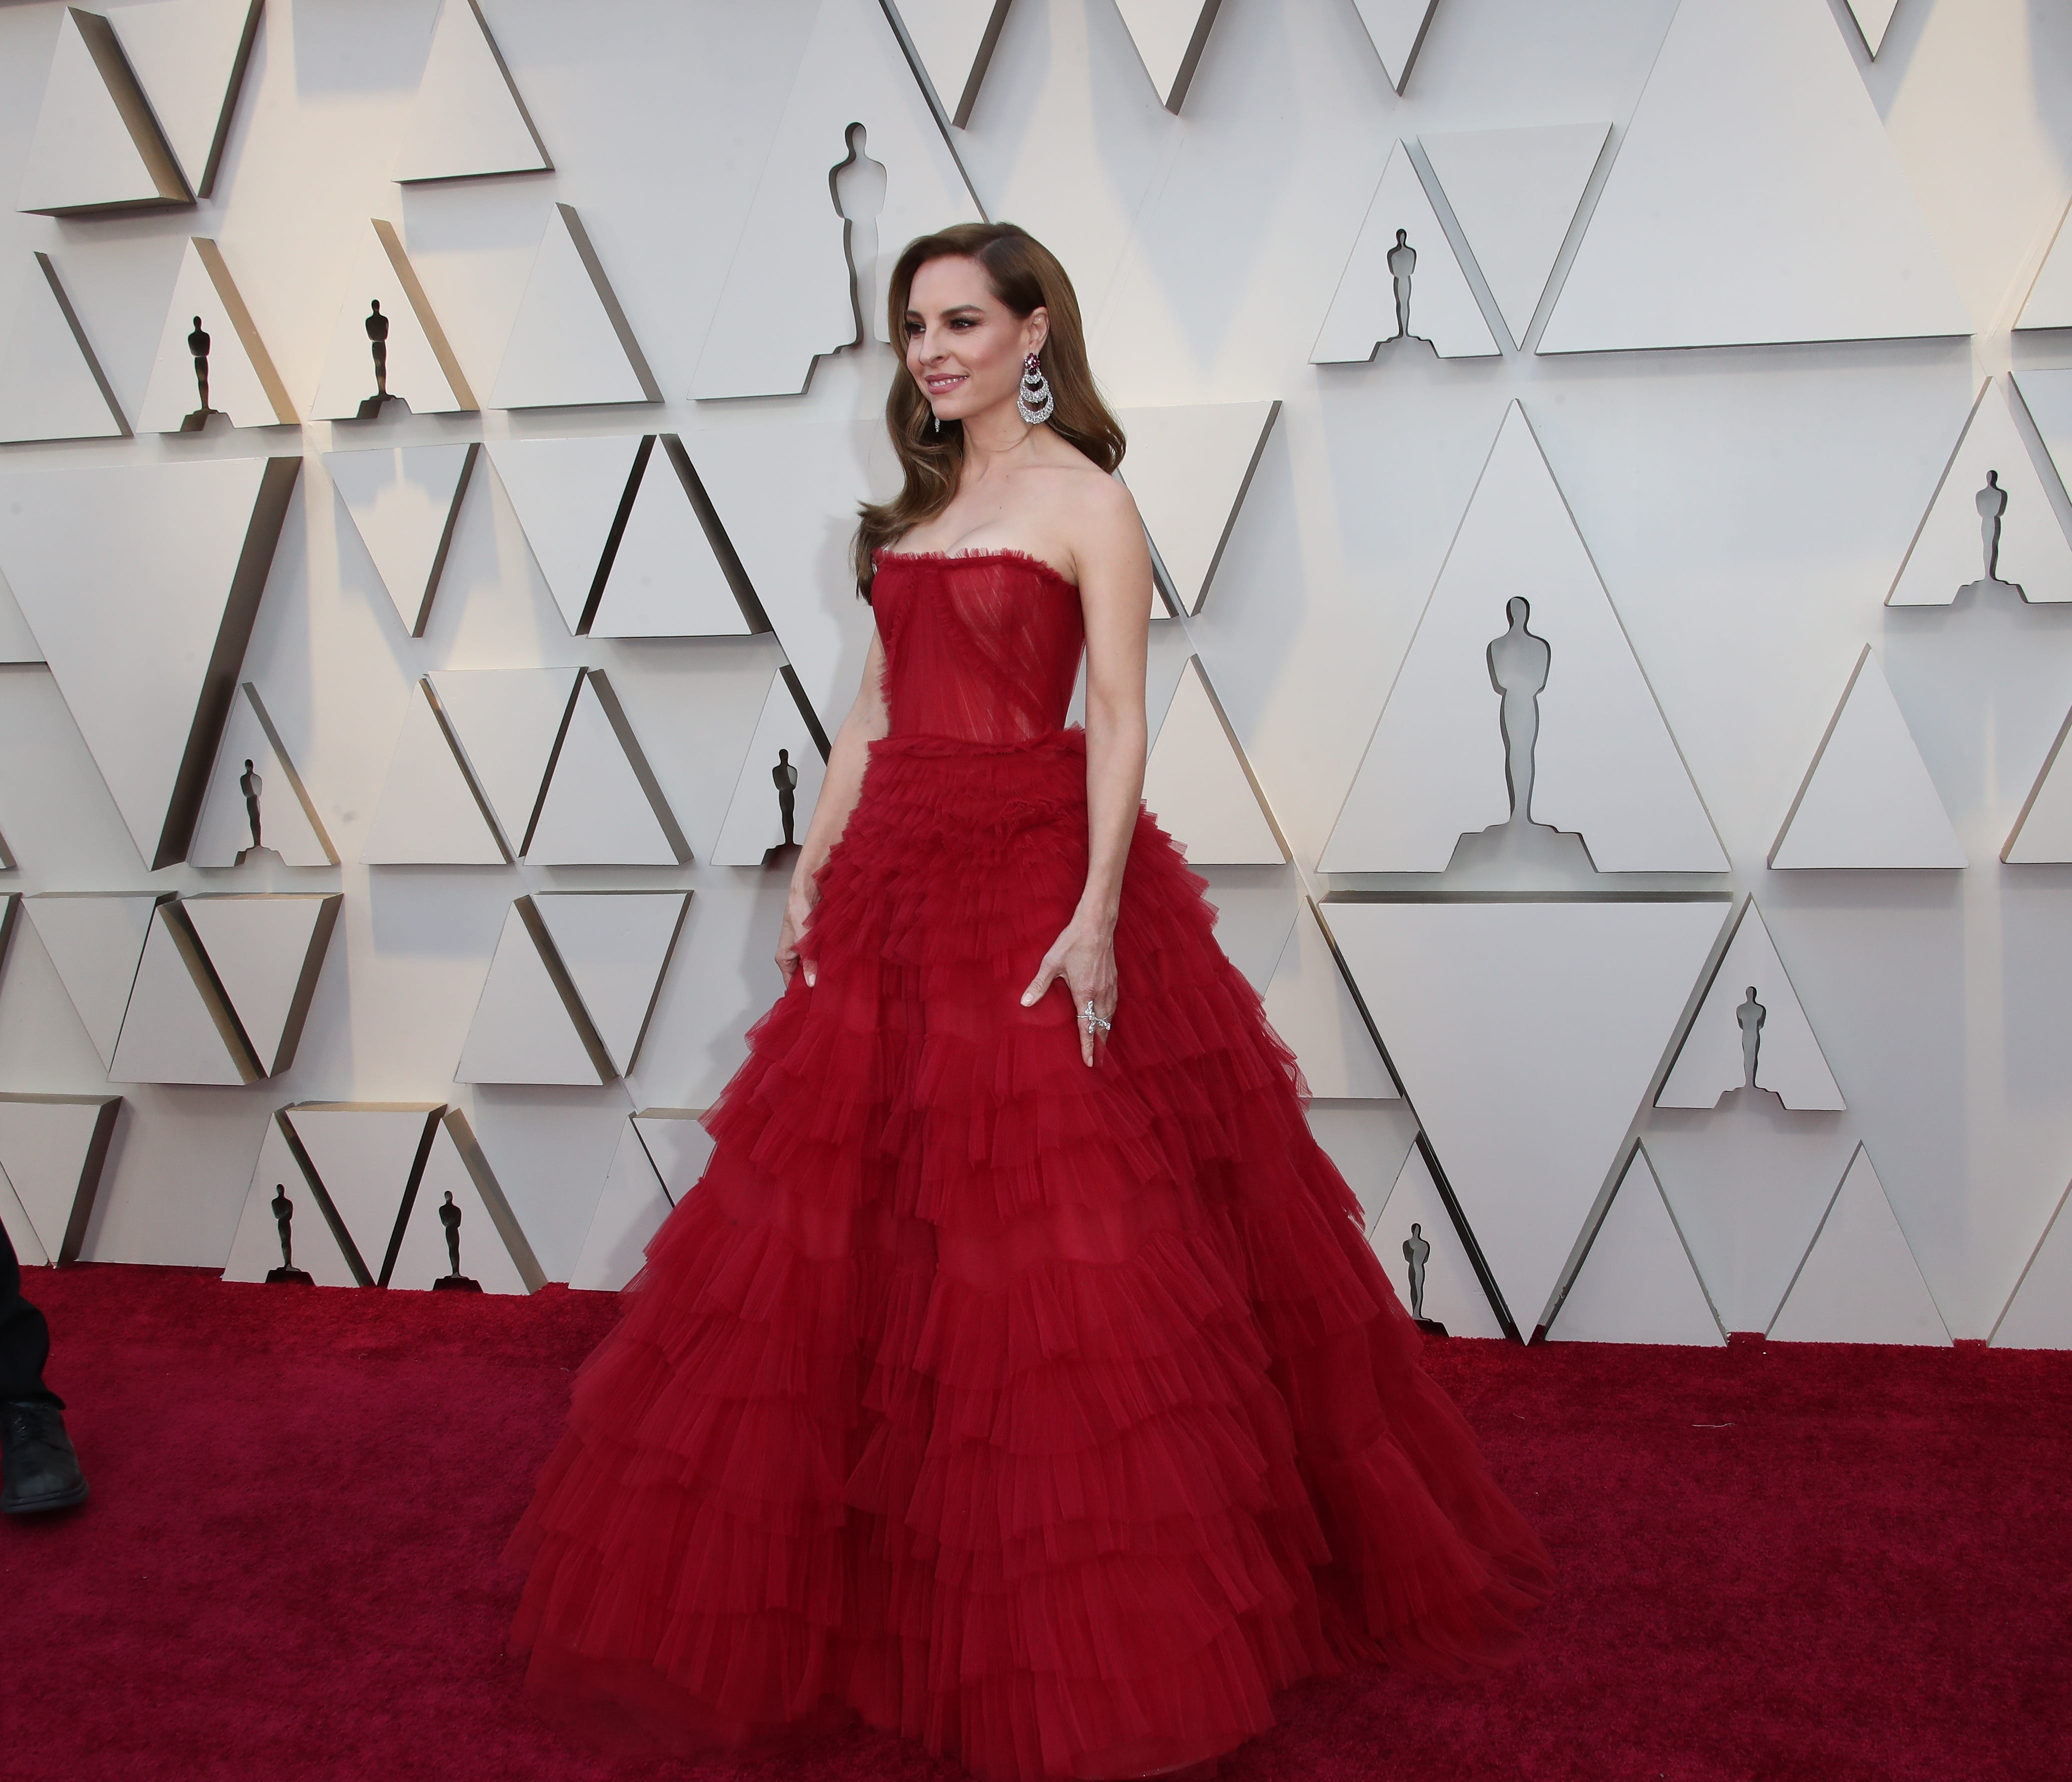 February 24, 2019; Los Angeles, CA, USA; Marina de Tavira arrives at the 91st Academy Awards at the Dolby Theatre. Mandatory Credit: Dan MacMedan-USA TODAY NETWORK (Via OlyDrop)